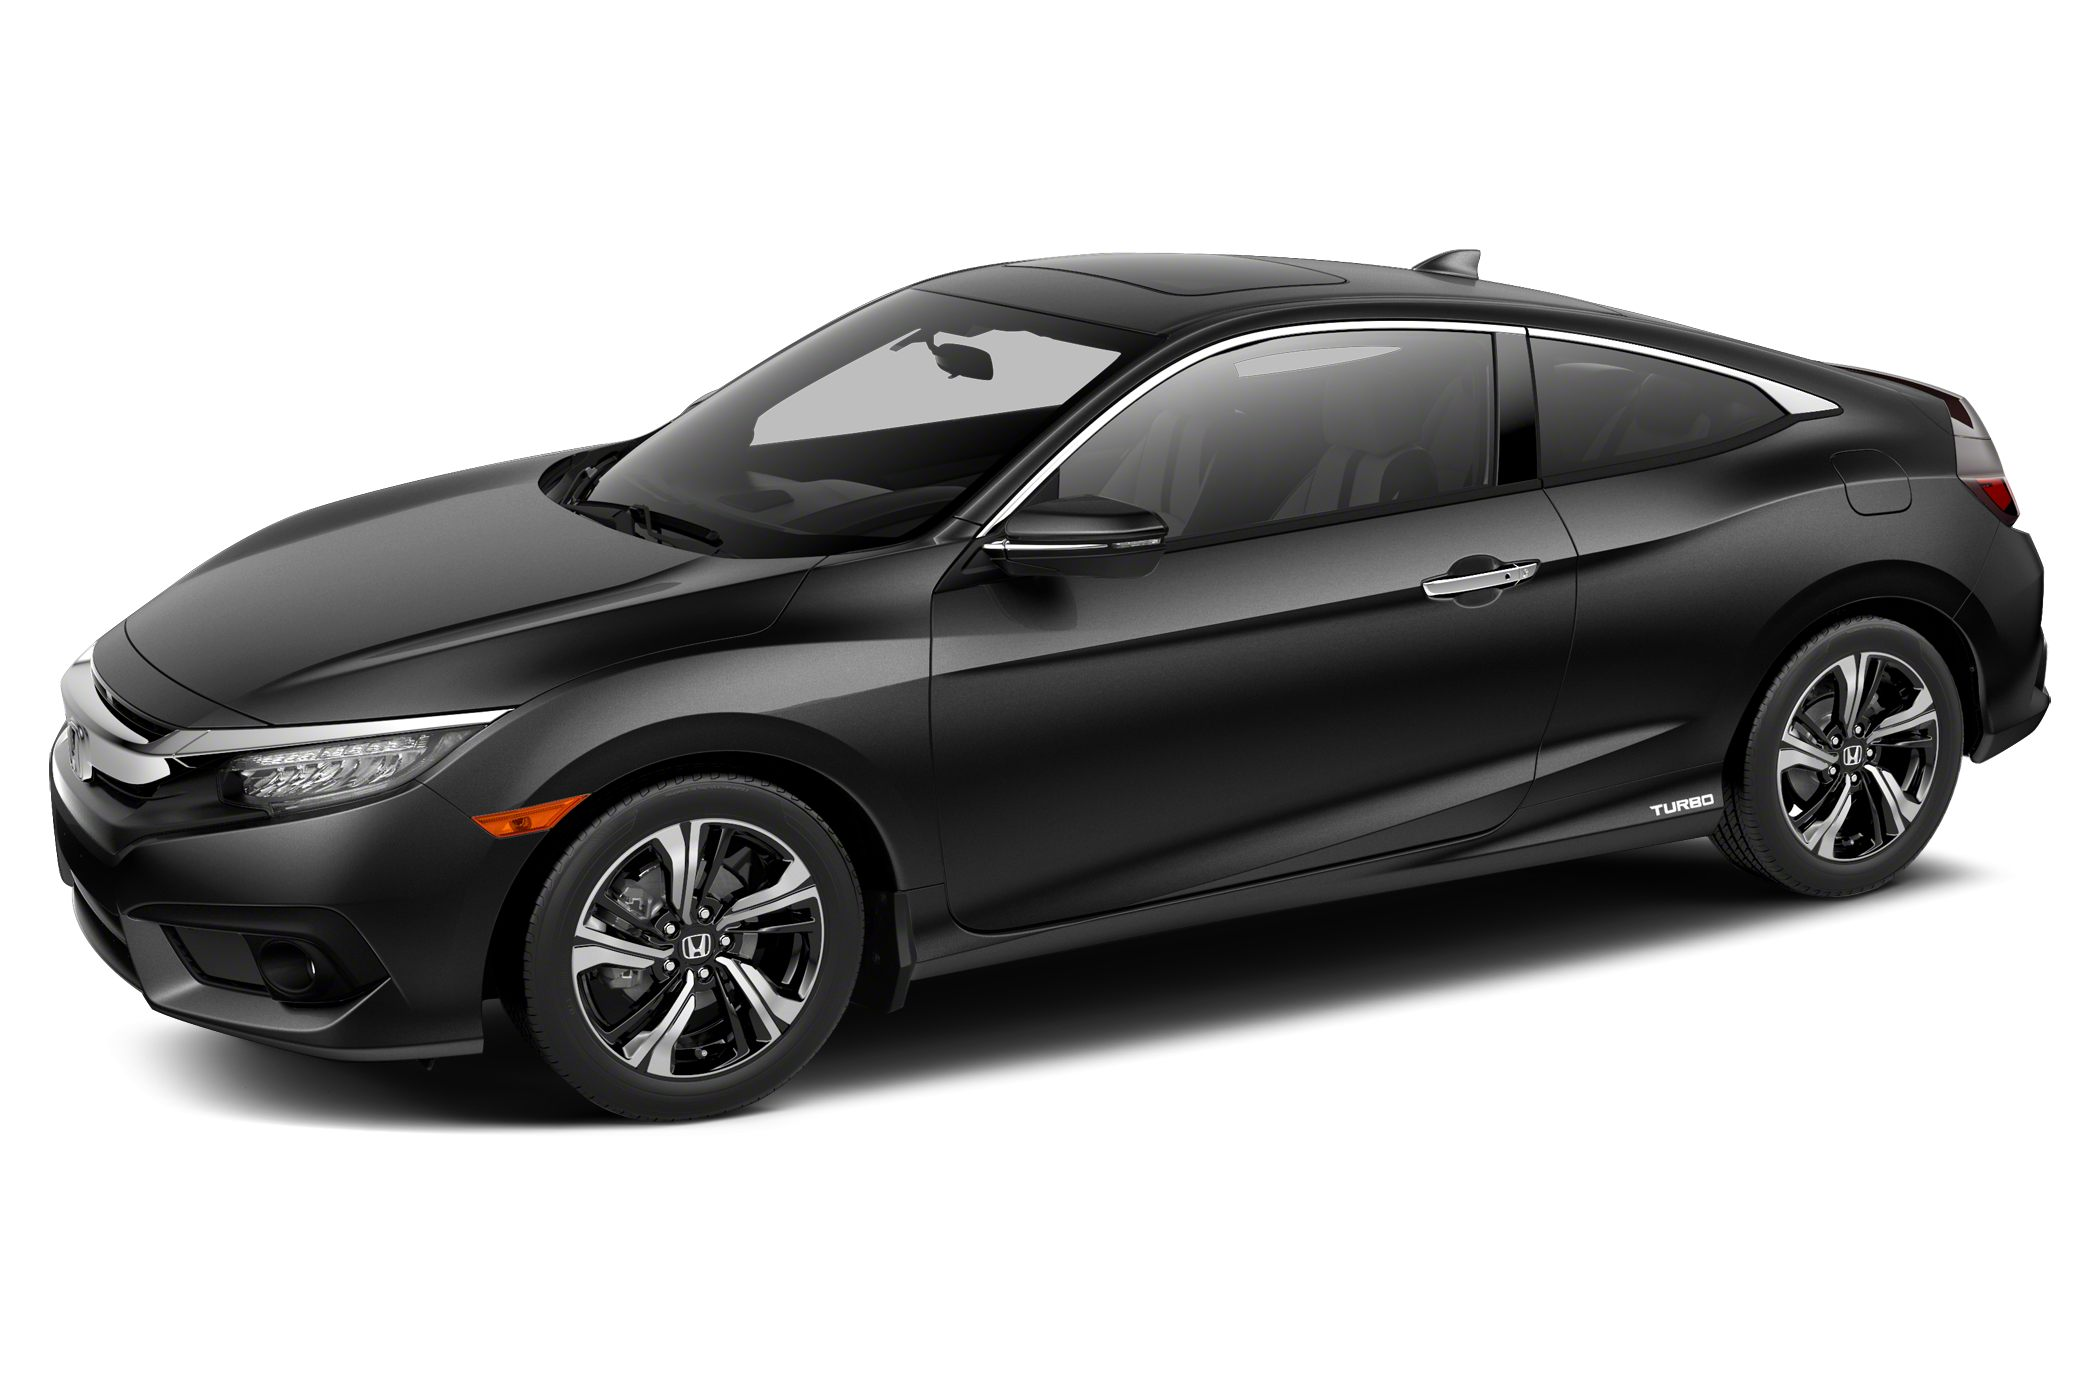 2018 Honda Civic Touring 2dr Coupe